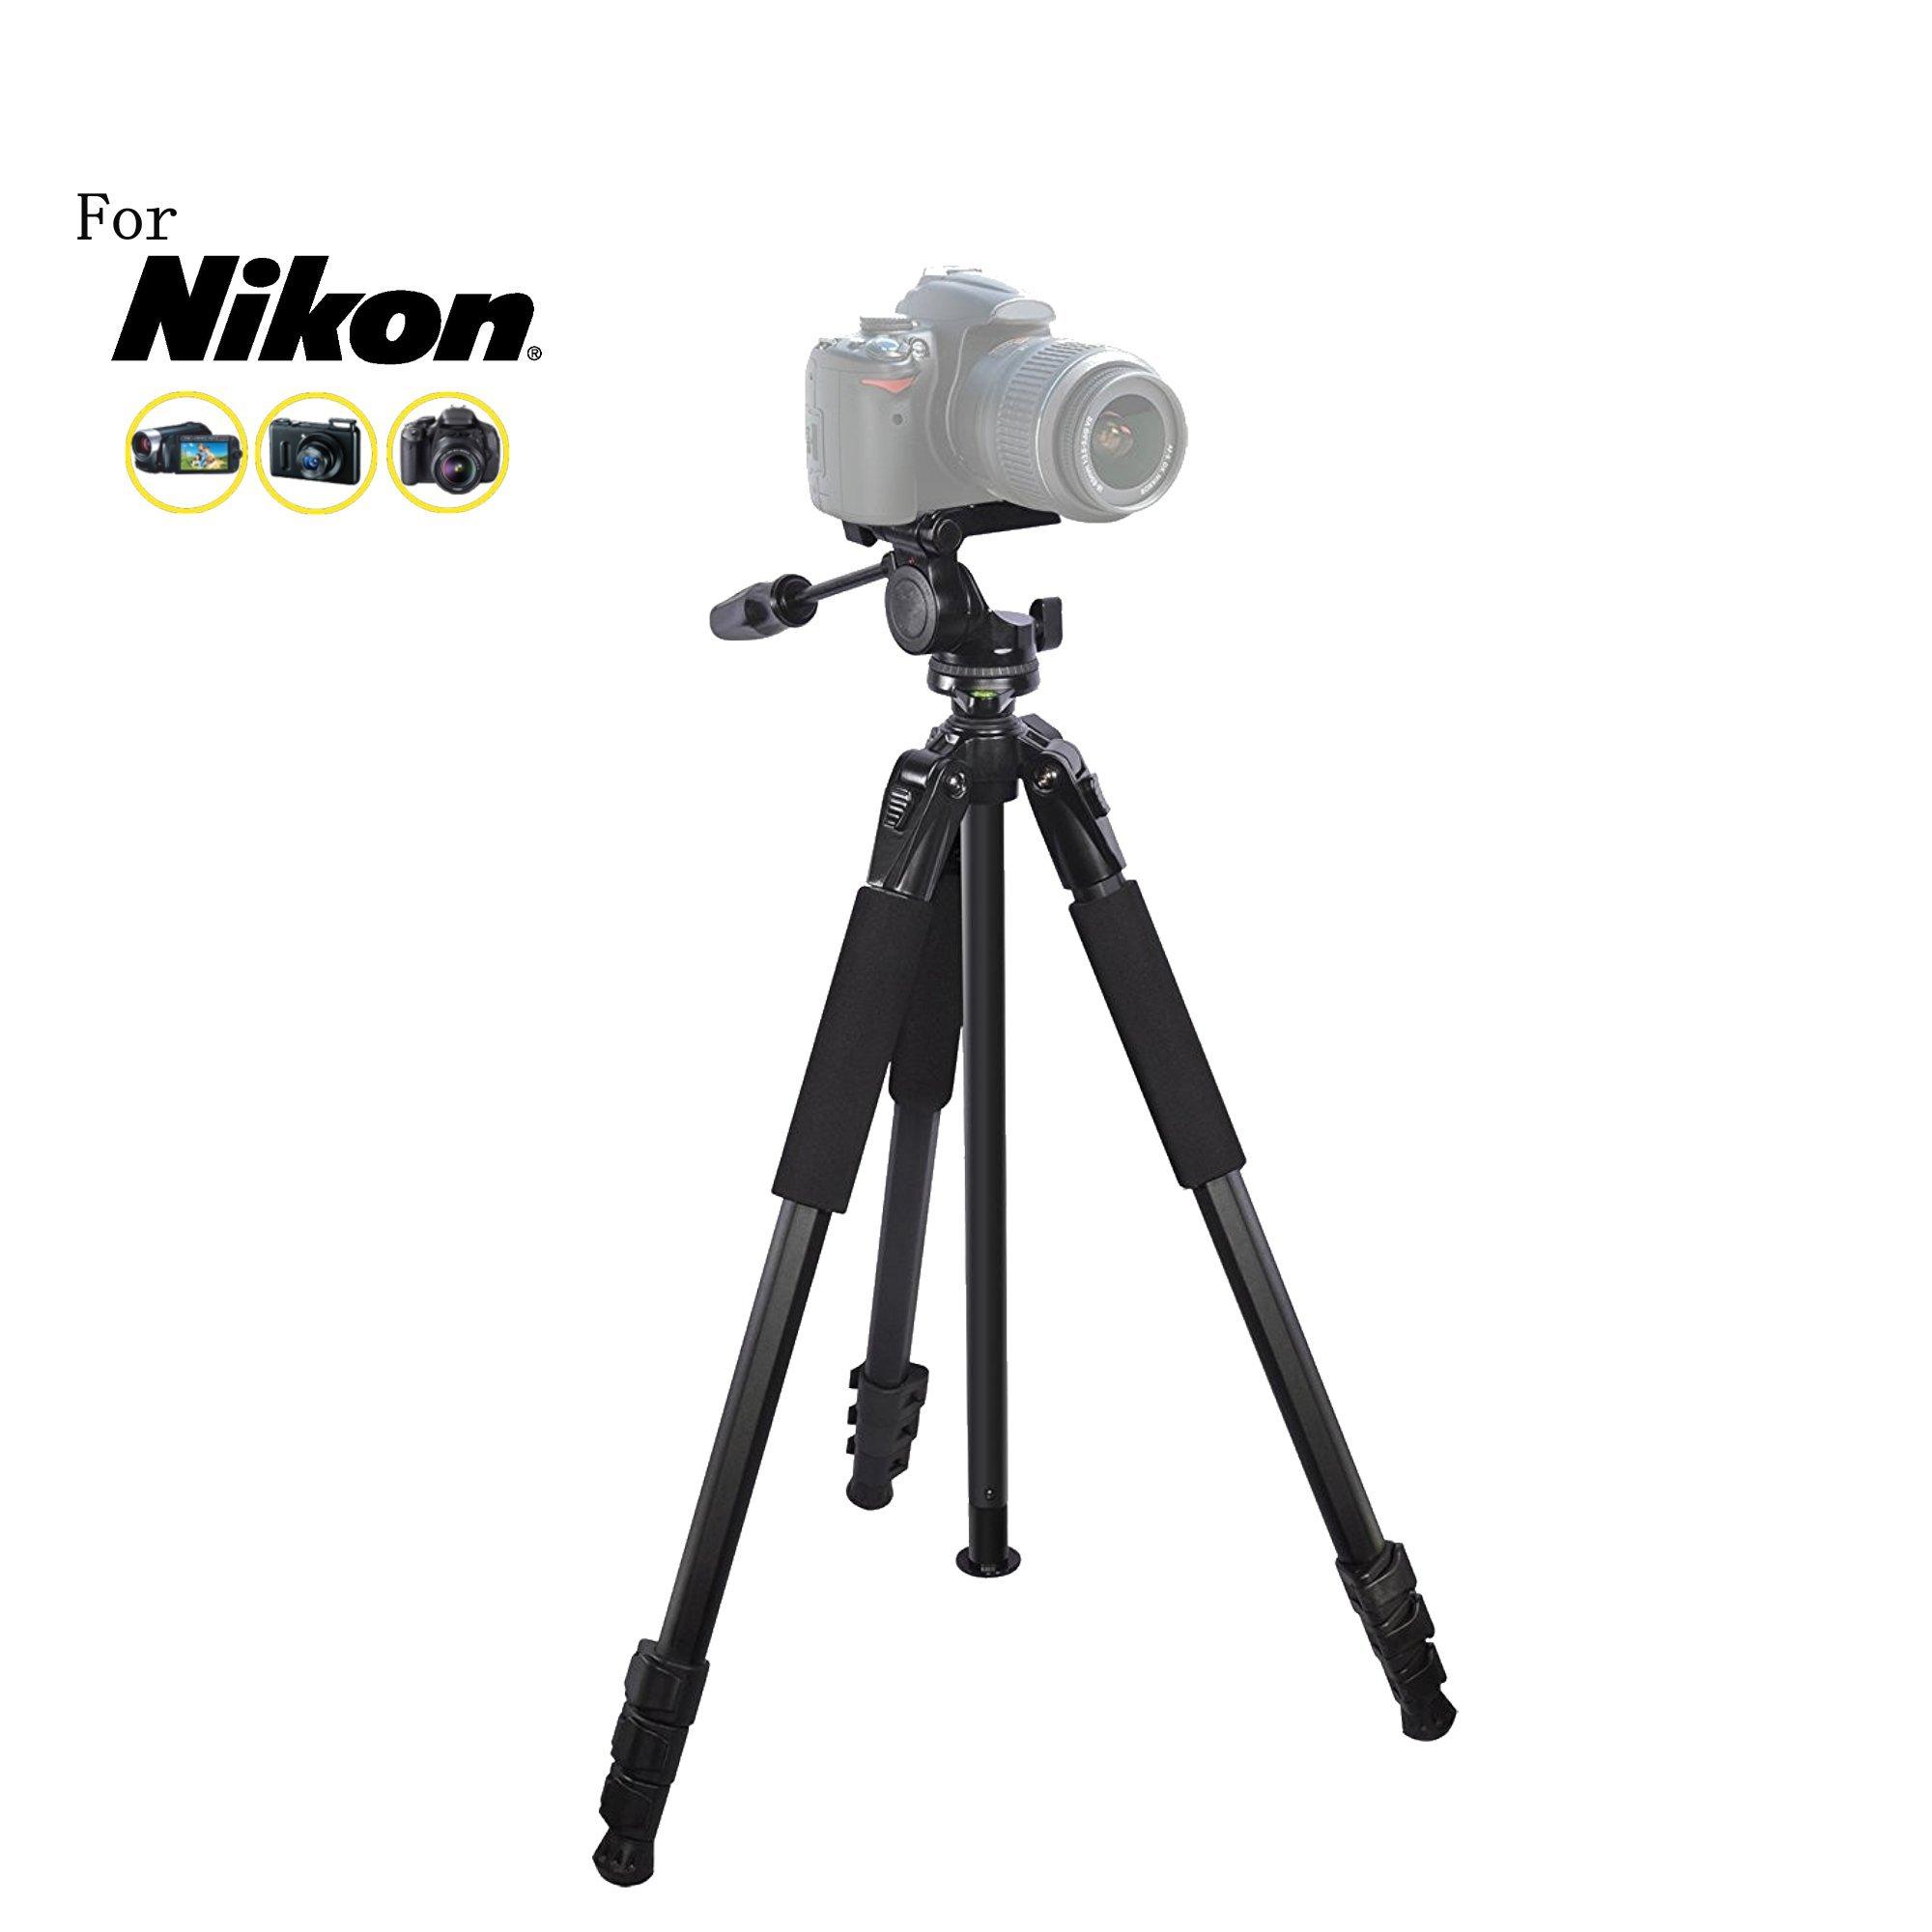 80 inch Heavy Duty Portable tripod for Nikon Df, D1H, D1X, D200, D2H, D2Hs, D2X, D2Xs, D3, D300, D300S, DL18-50, DL24-500, DL24-85 Cameras: Travel tripod by iSnapPhoto